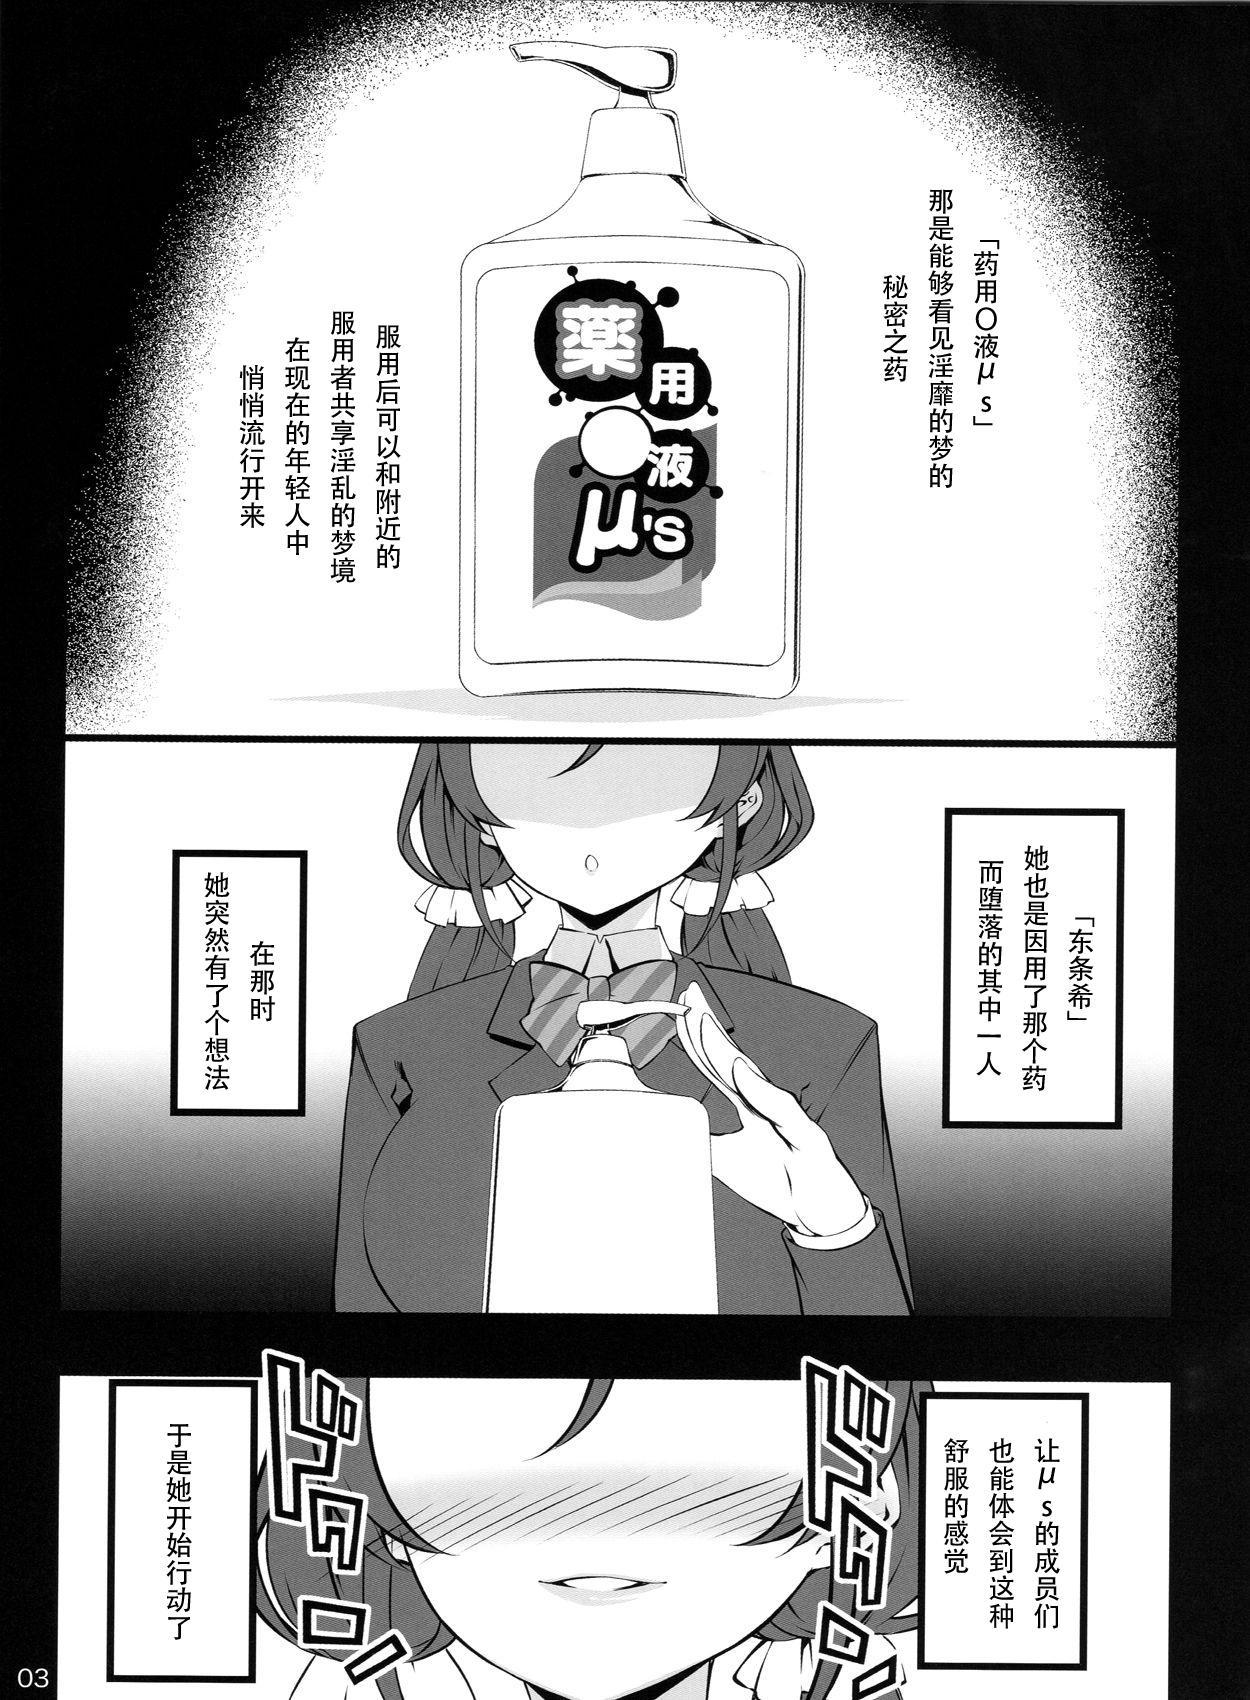 Yakuyou Seieki μ's 1